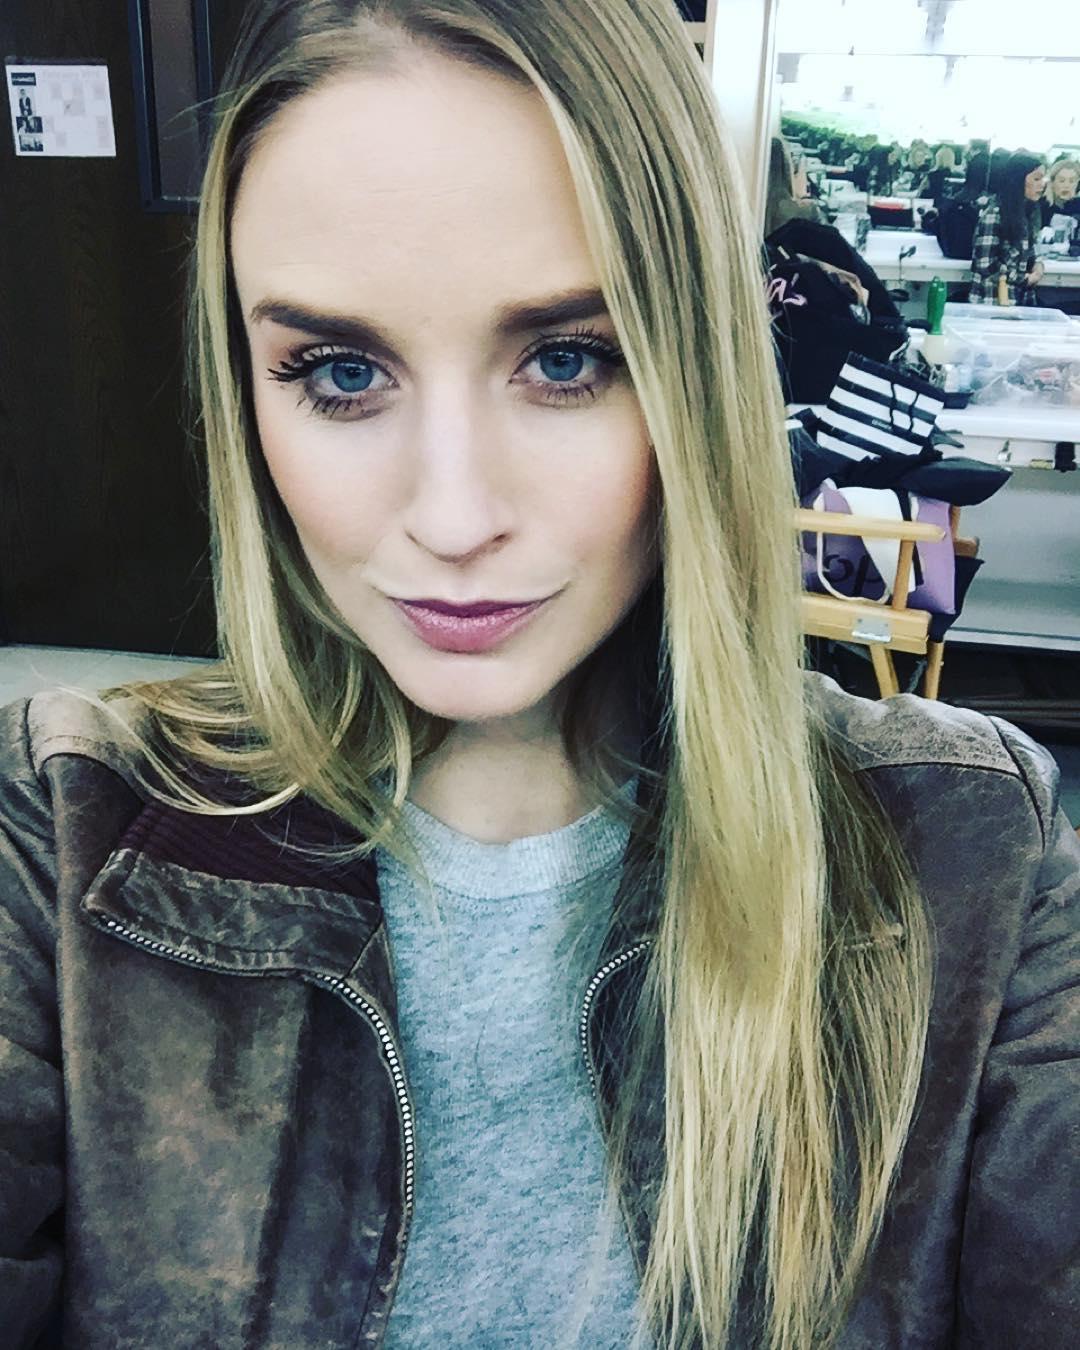 Still not thinking about the #superbowl #sorrynotsorry #makeupchair #selfie #naturalbeauty #model @lamodelsrunway @astonmodels